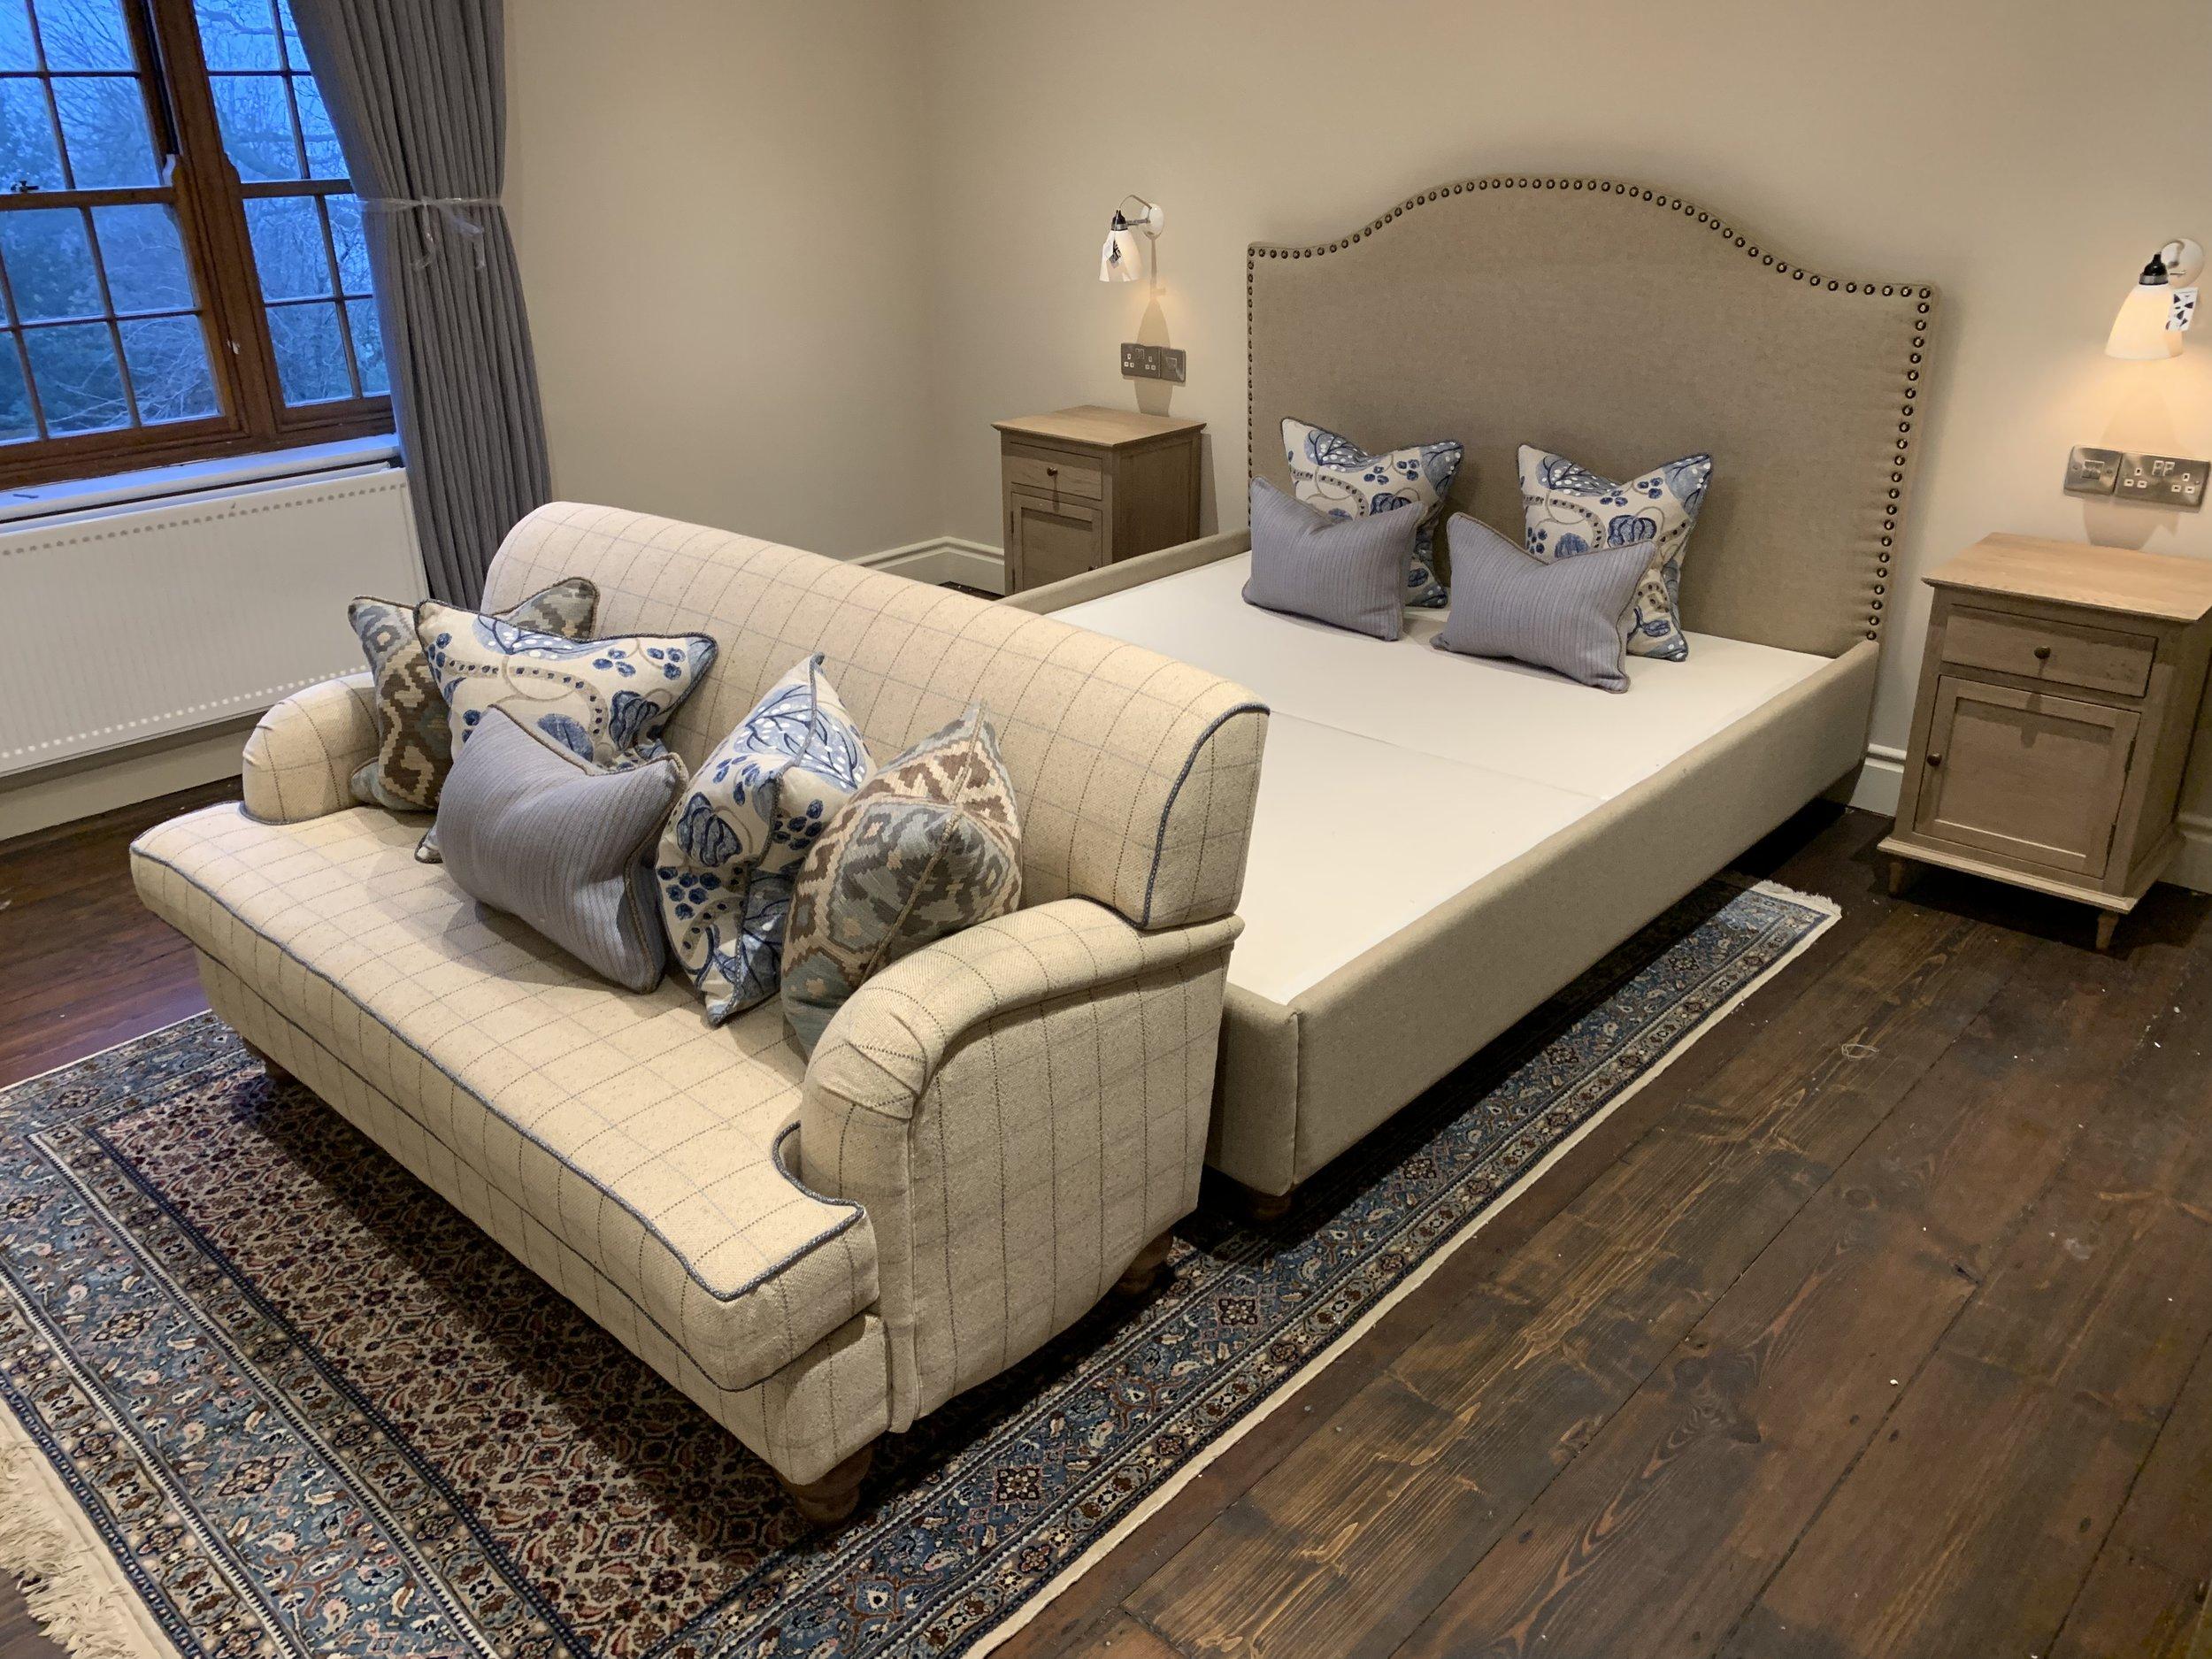 Bespoke bed and headboard